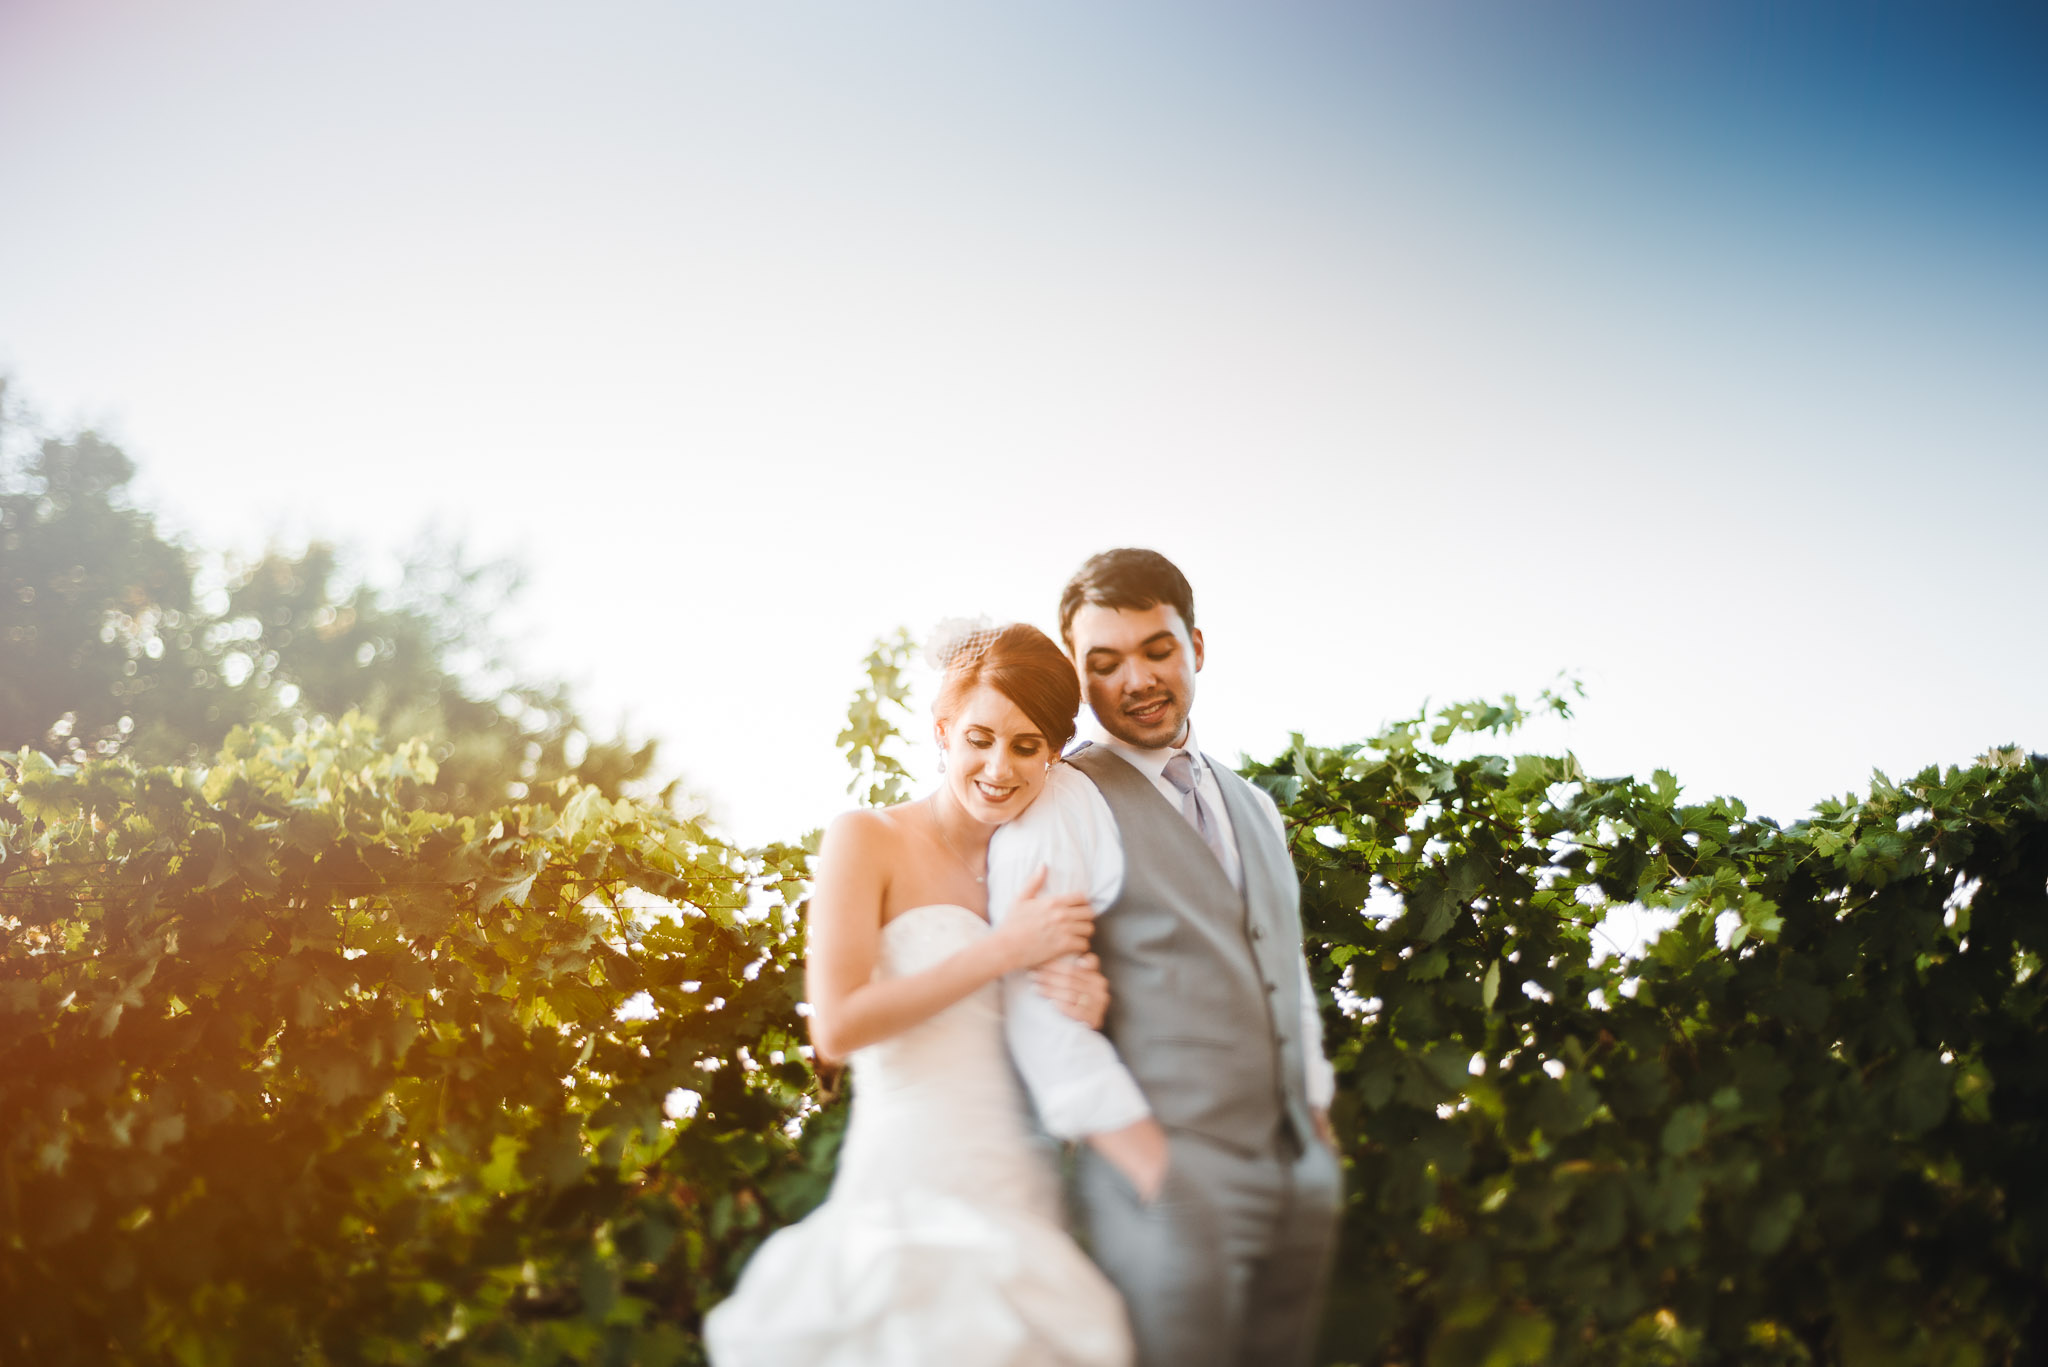 Chapel-In-The-Vineyard-Christoval-Vineyards-and-Winery-Wedding_Kayla&Eric-0058.jpg